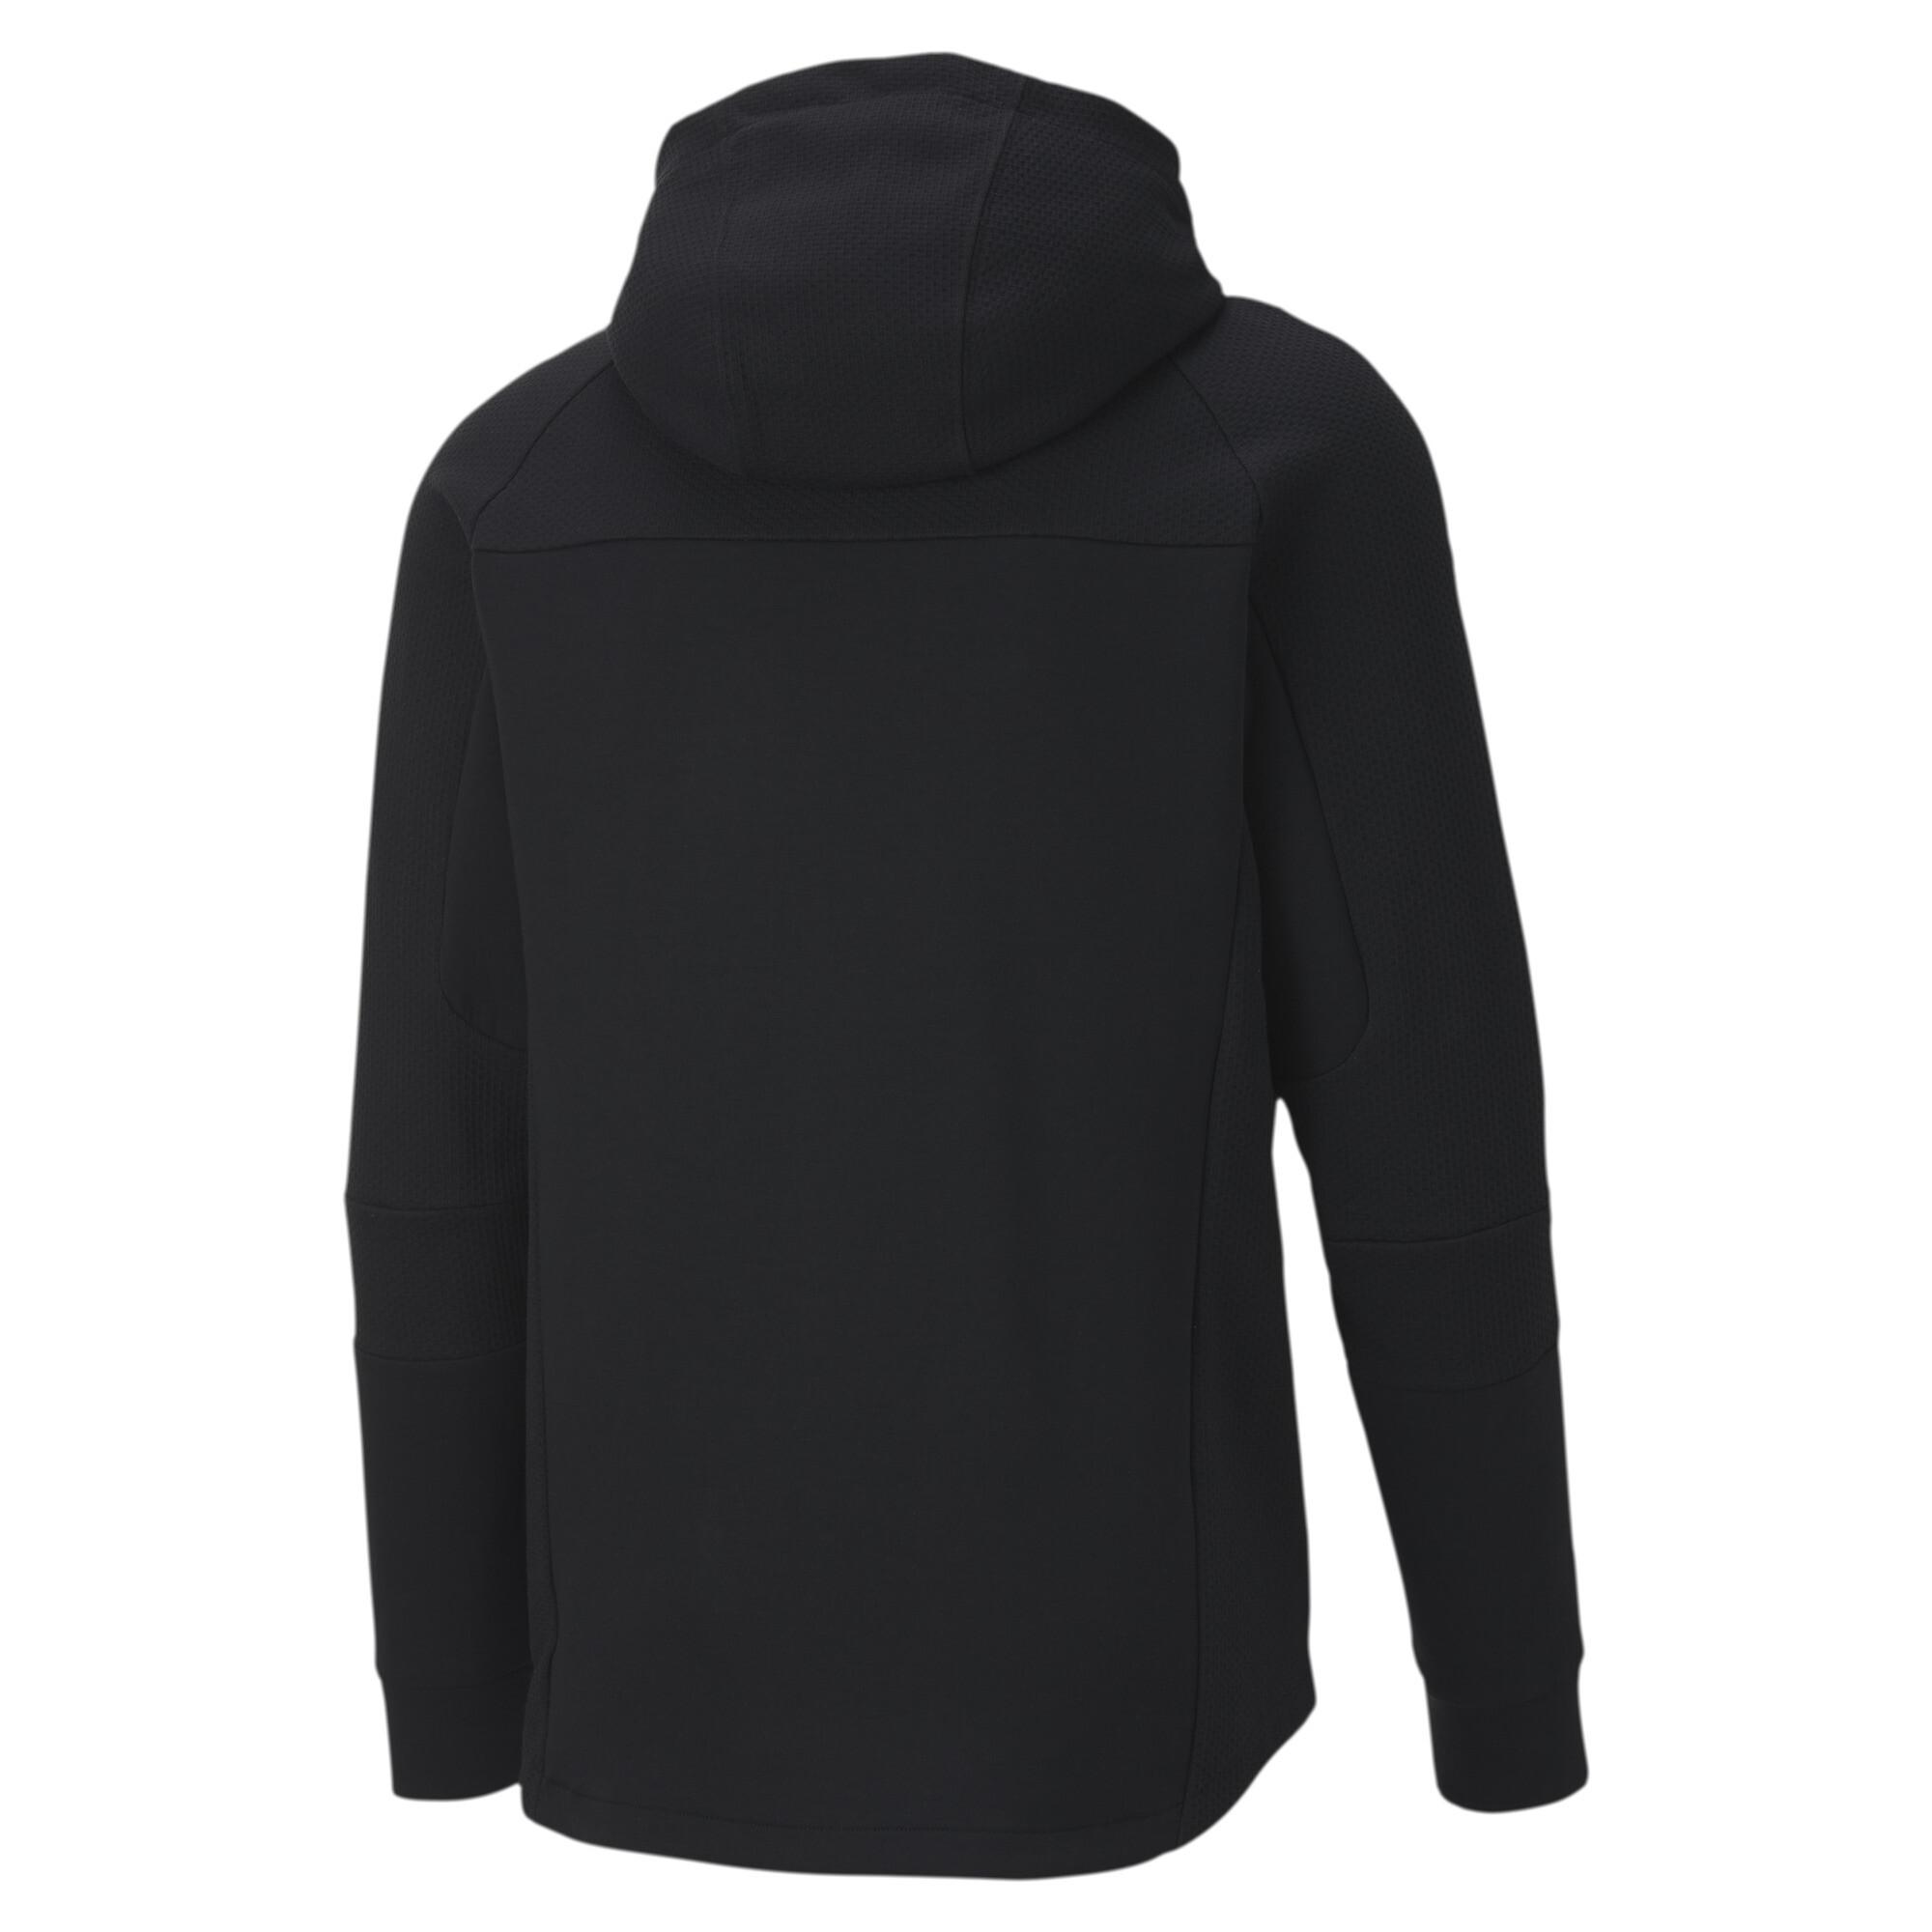 PUMA-Evostripe-Men-039-s-Hooded-Jacket-Men-Sweat-Basics thumbnail 13